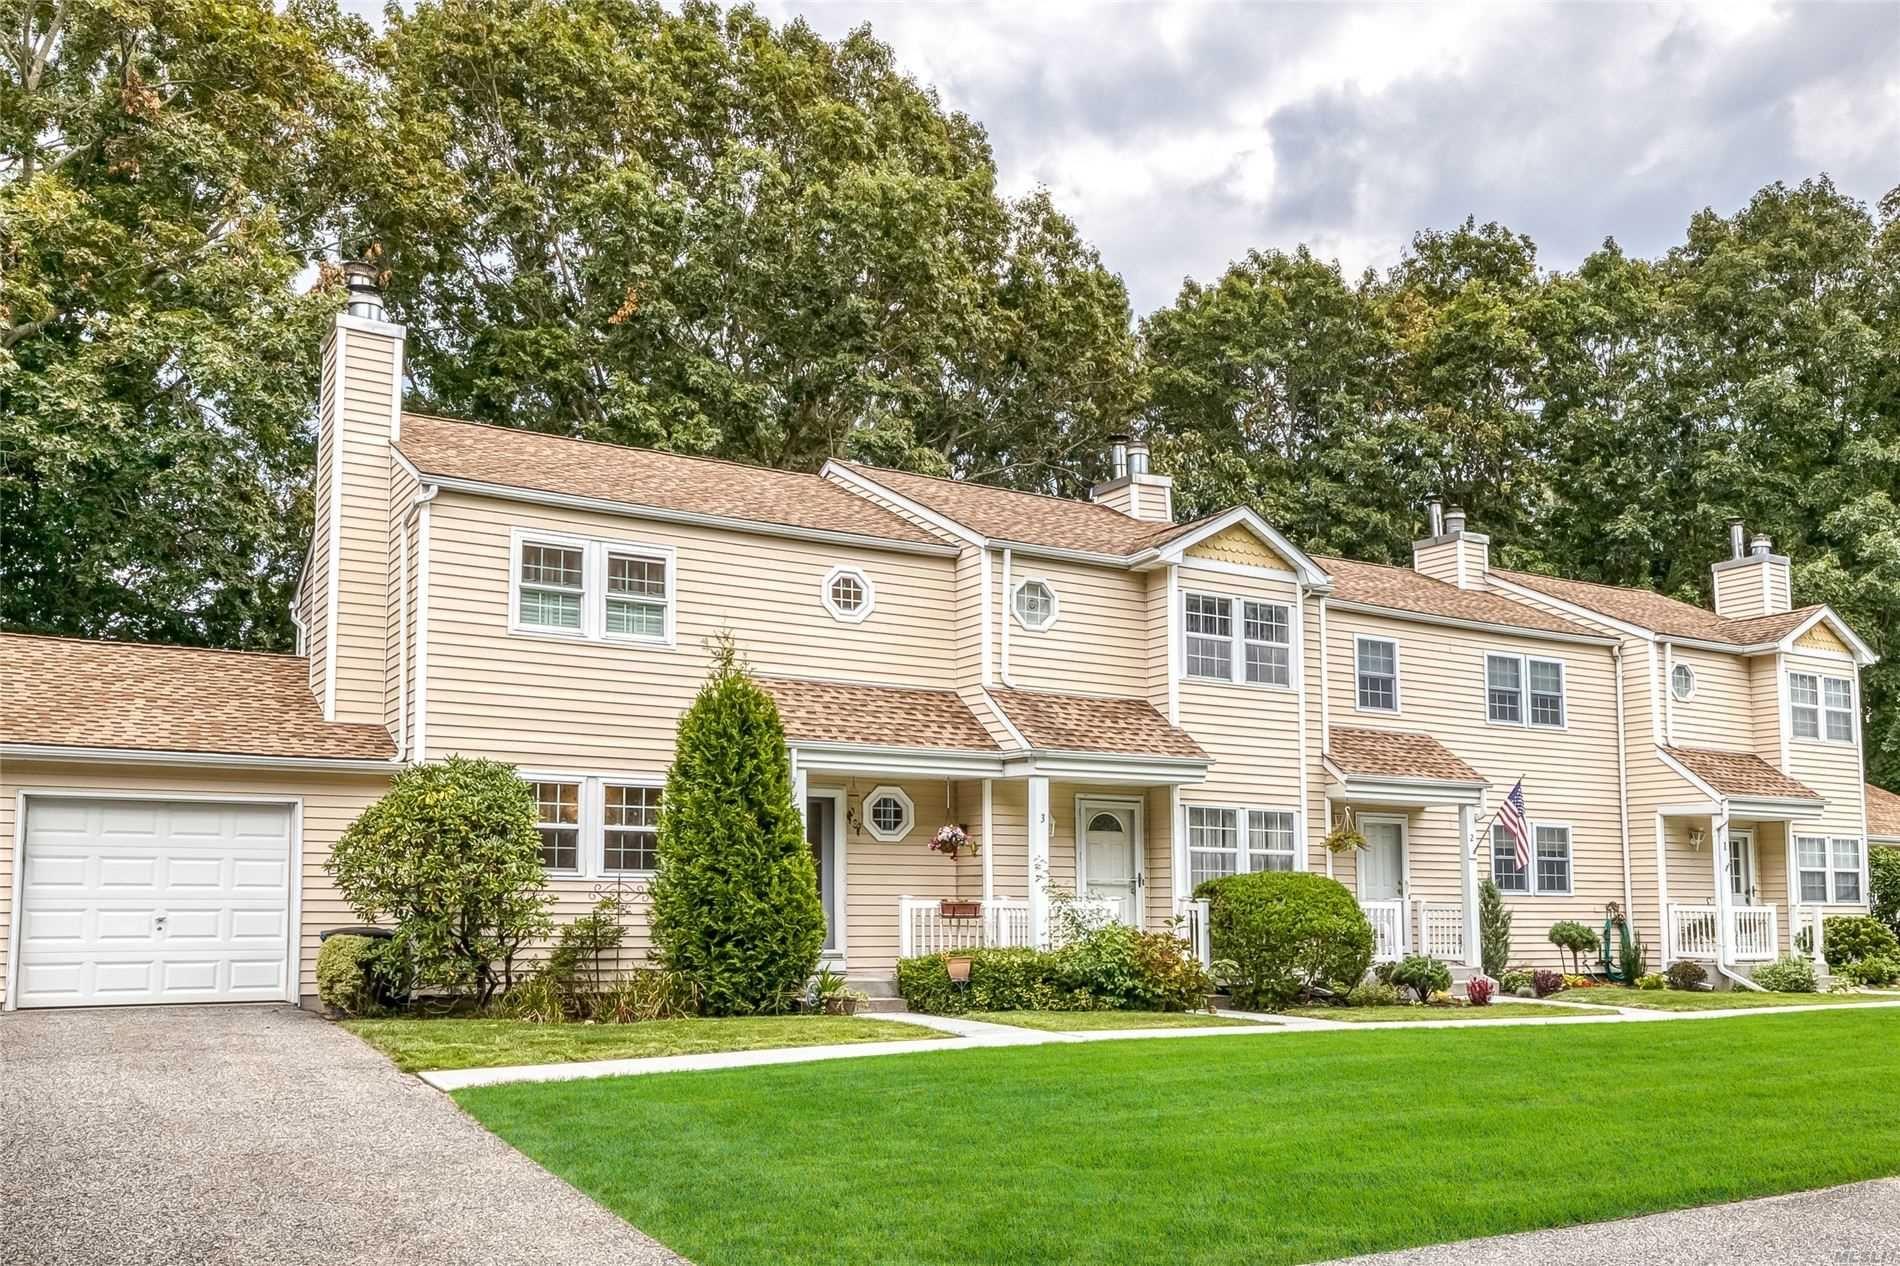 4 Adams Commons, Yaphank, NY 11980 - MLS#: 3247463